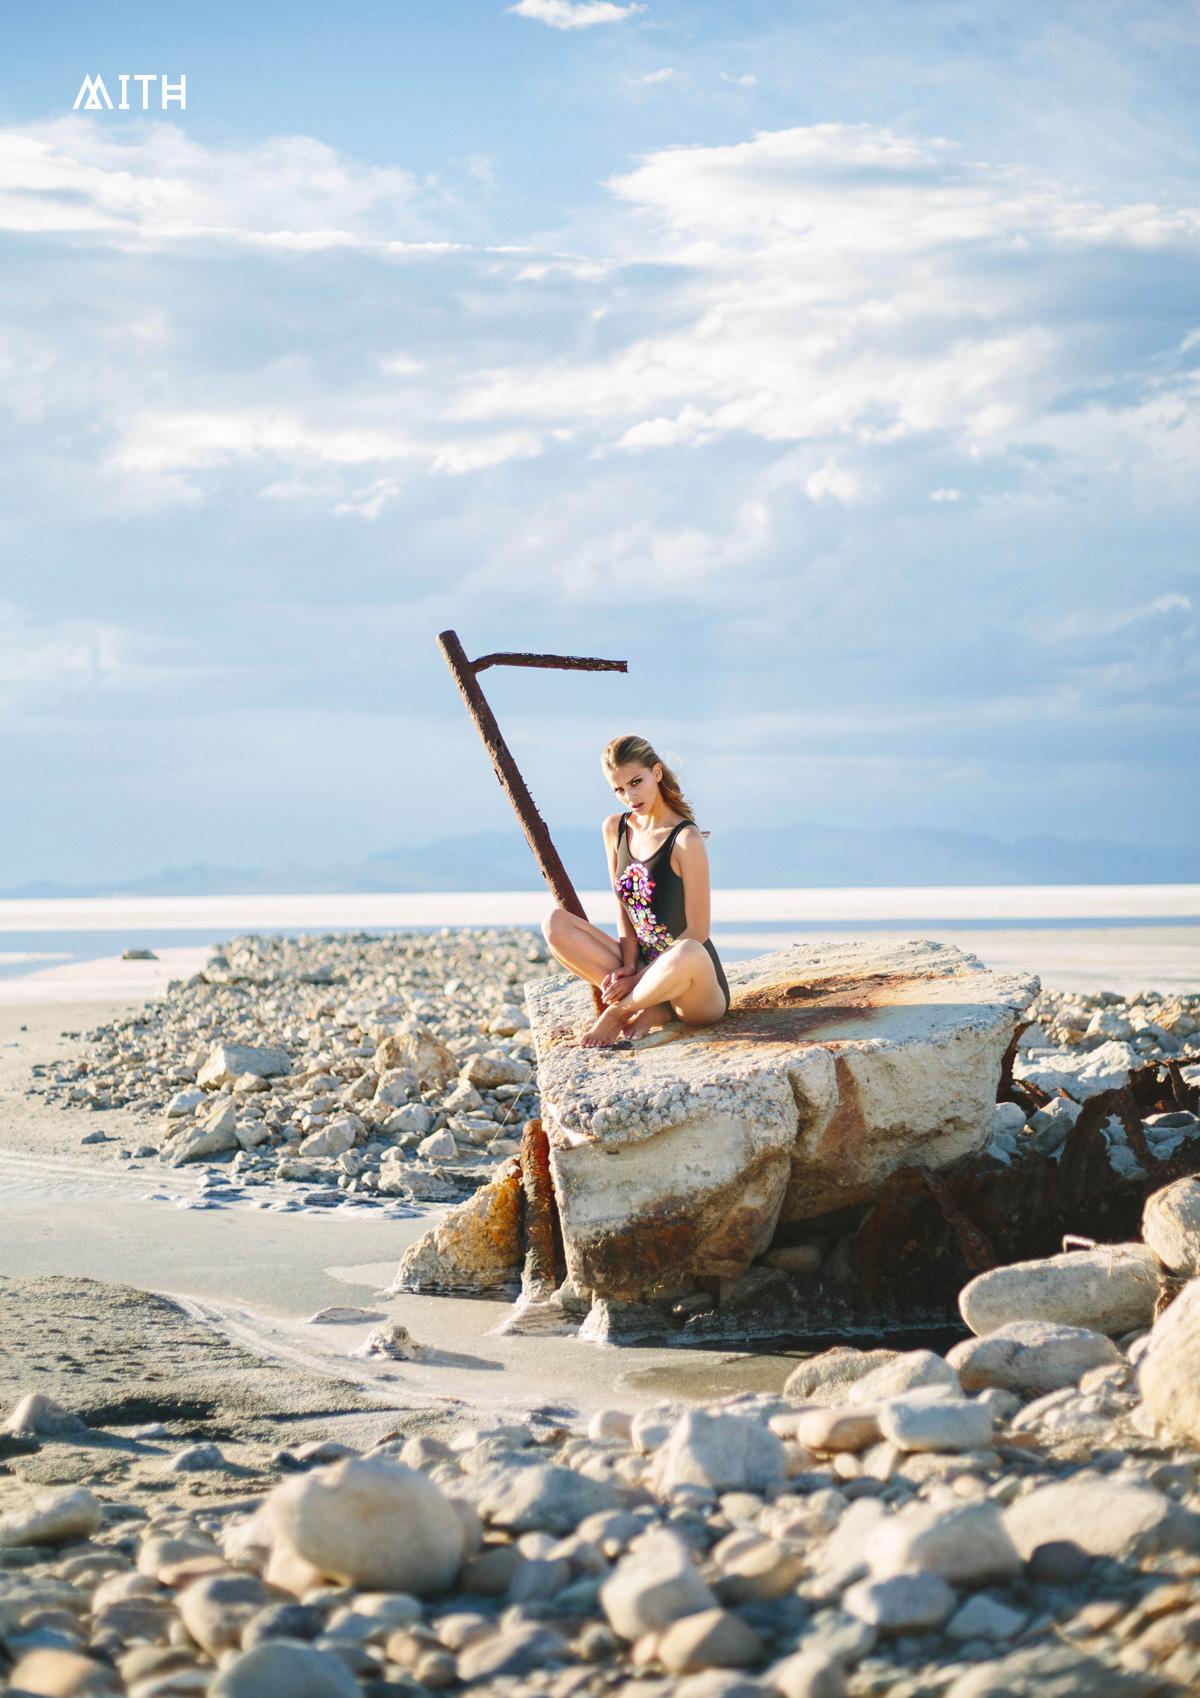 MITH_sun-soaked_marina-laswick_morgan-nielson_web29